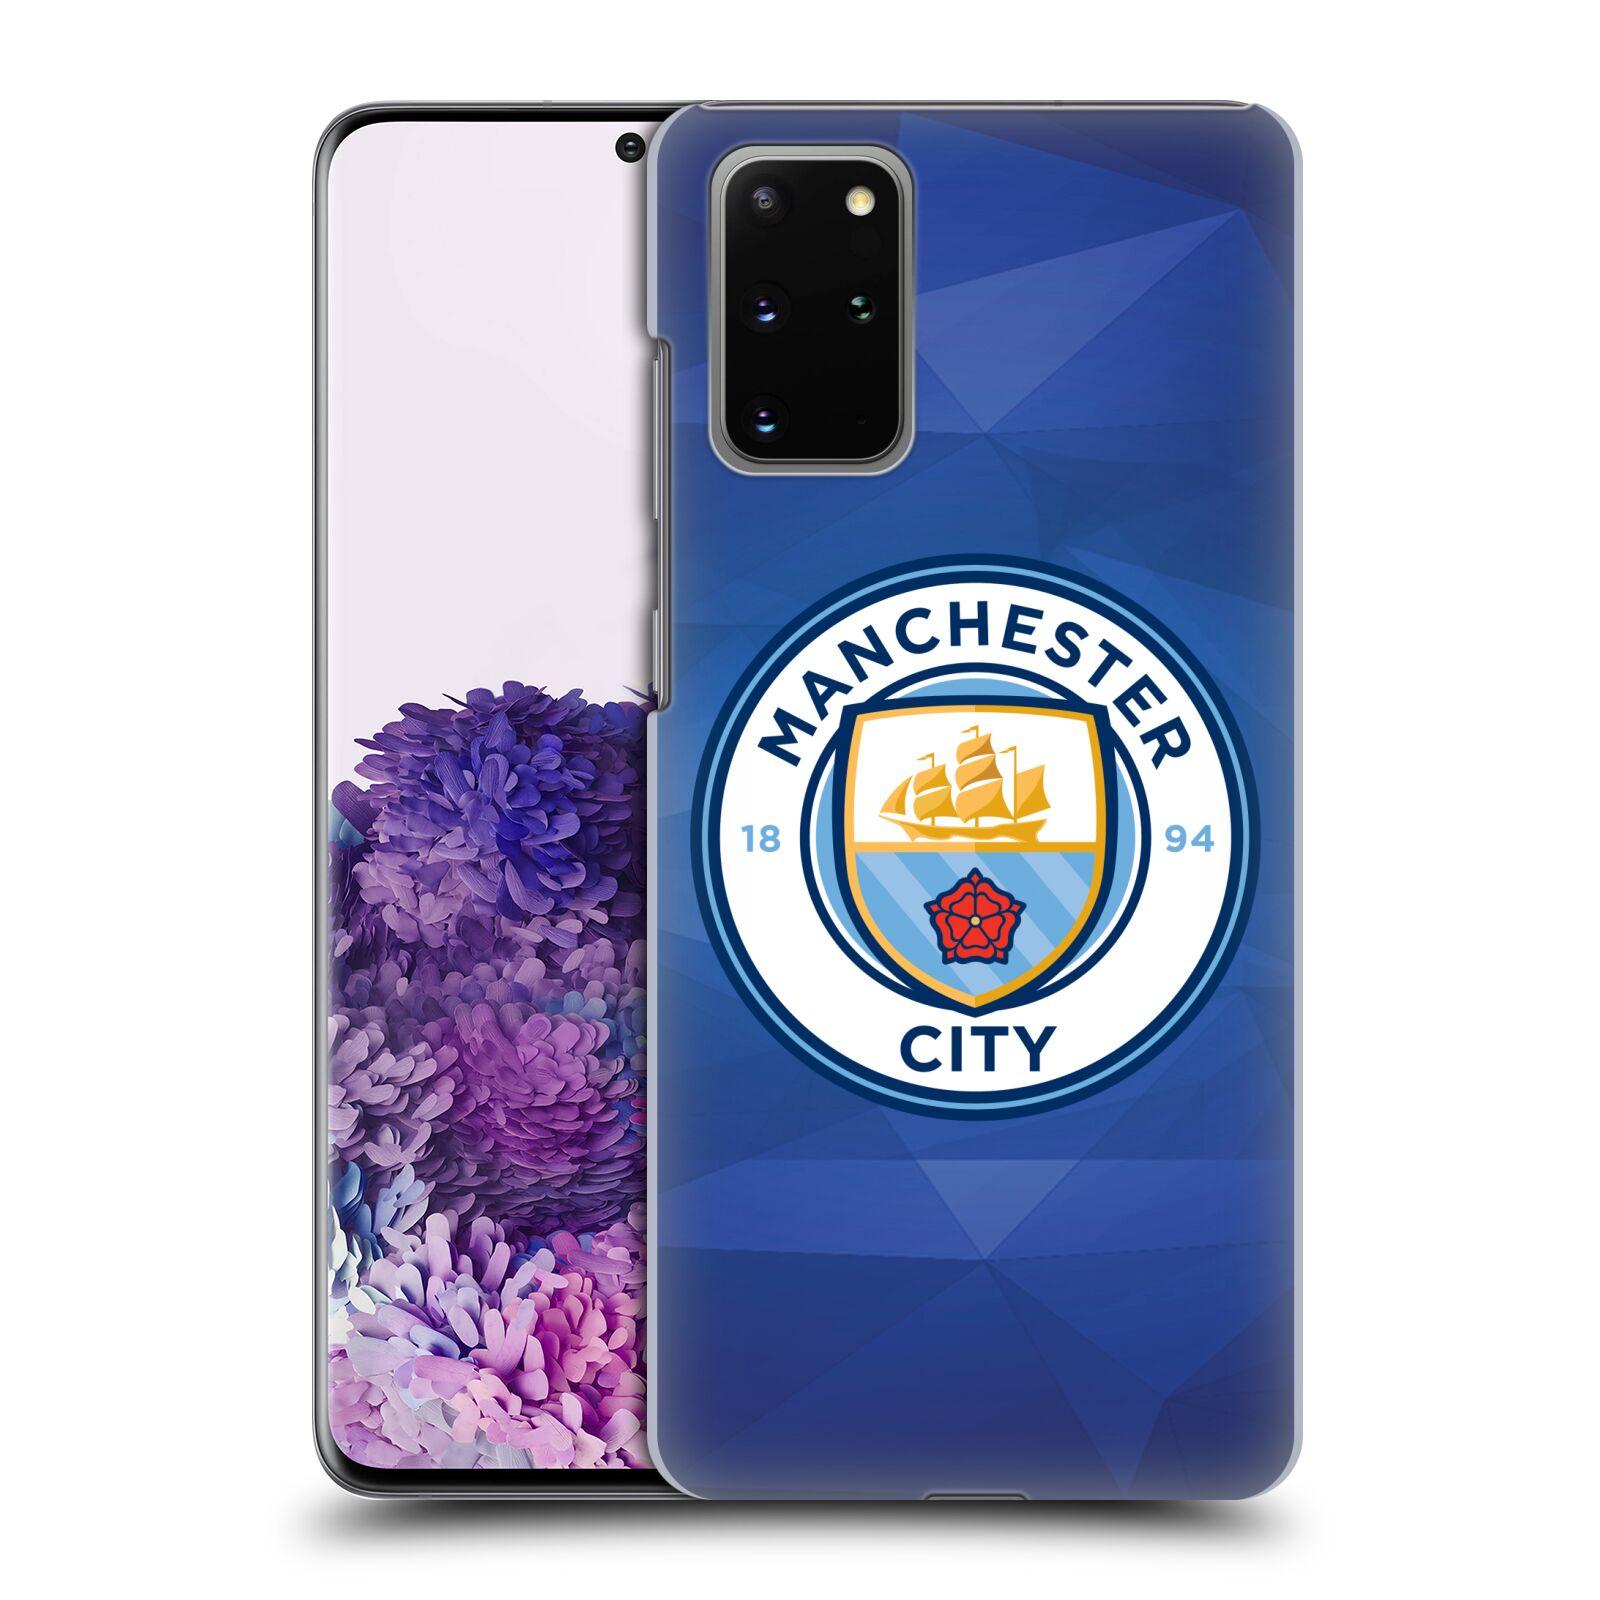 Plastové pouzdro na mobil Samsung Galaxy S20 Plus - Head Case - Manchester City FC - Modré nové logo